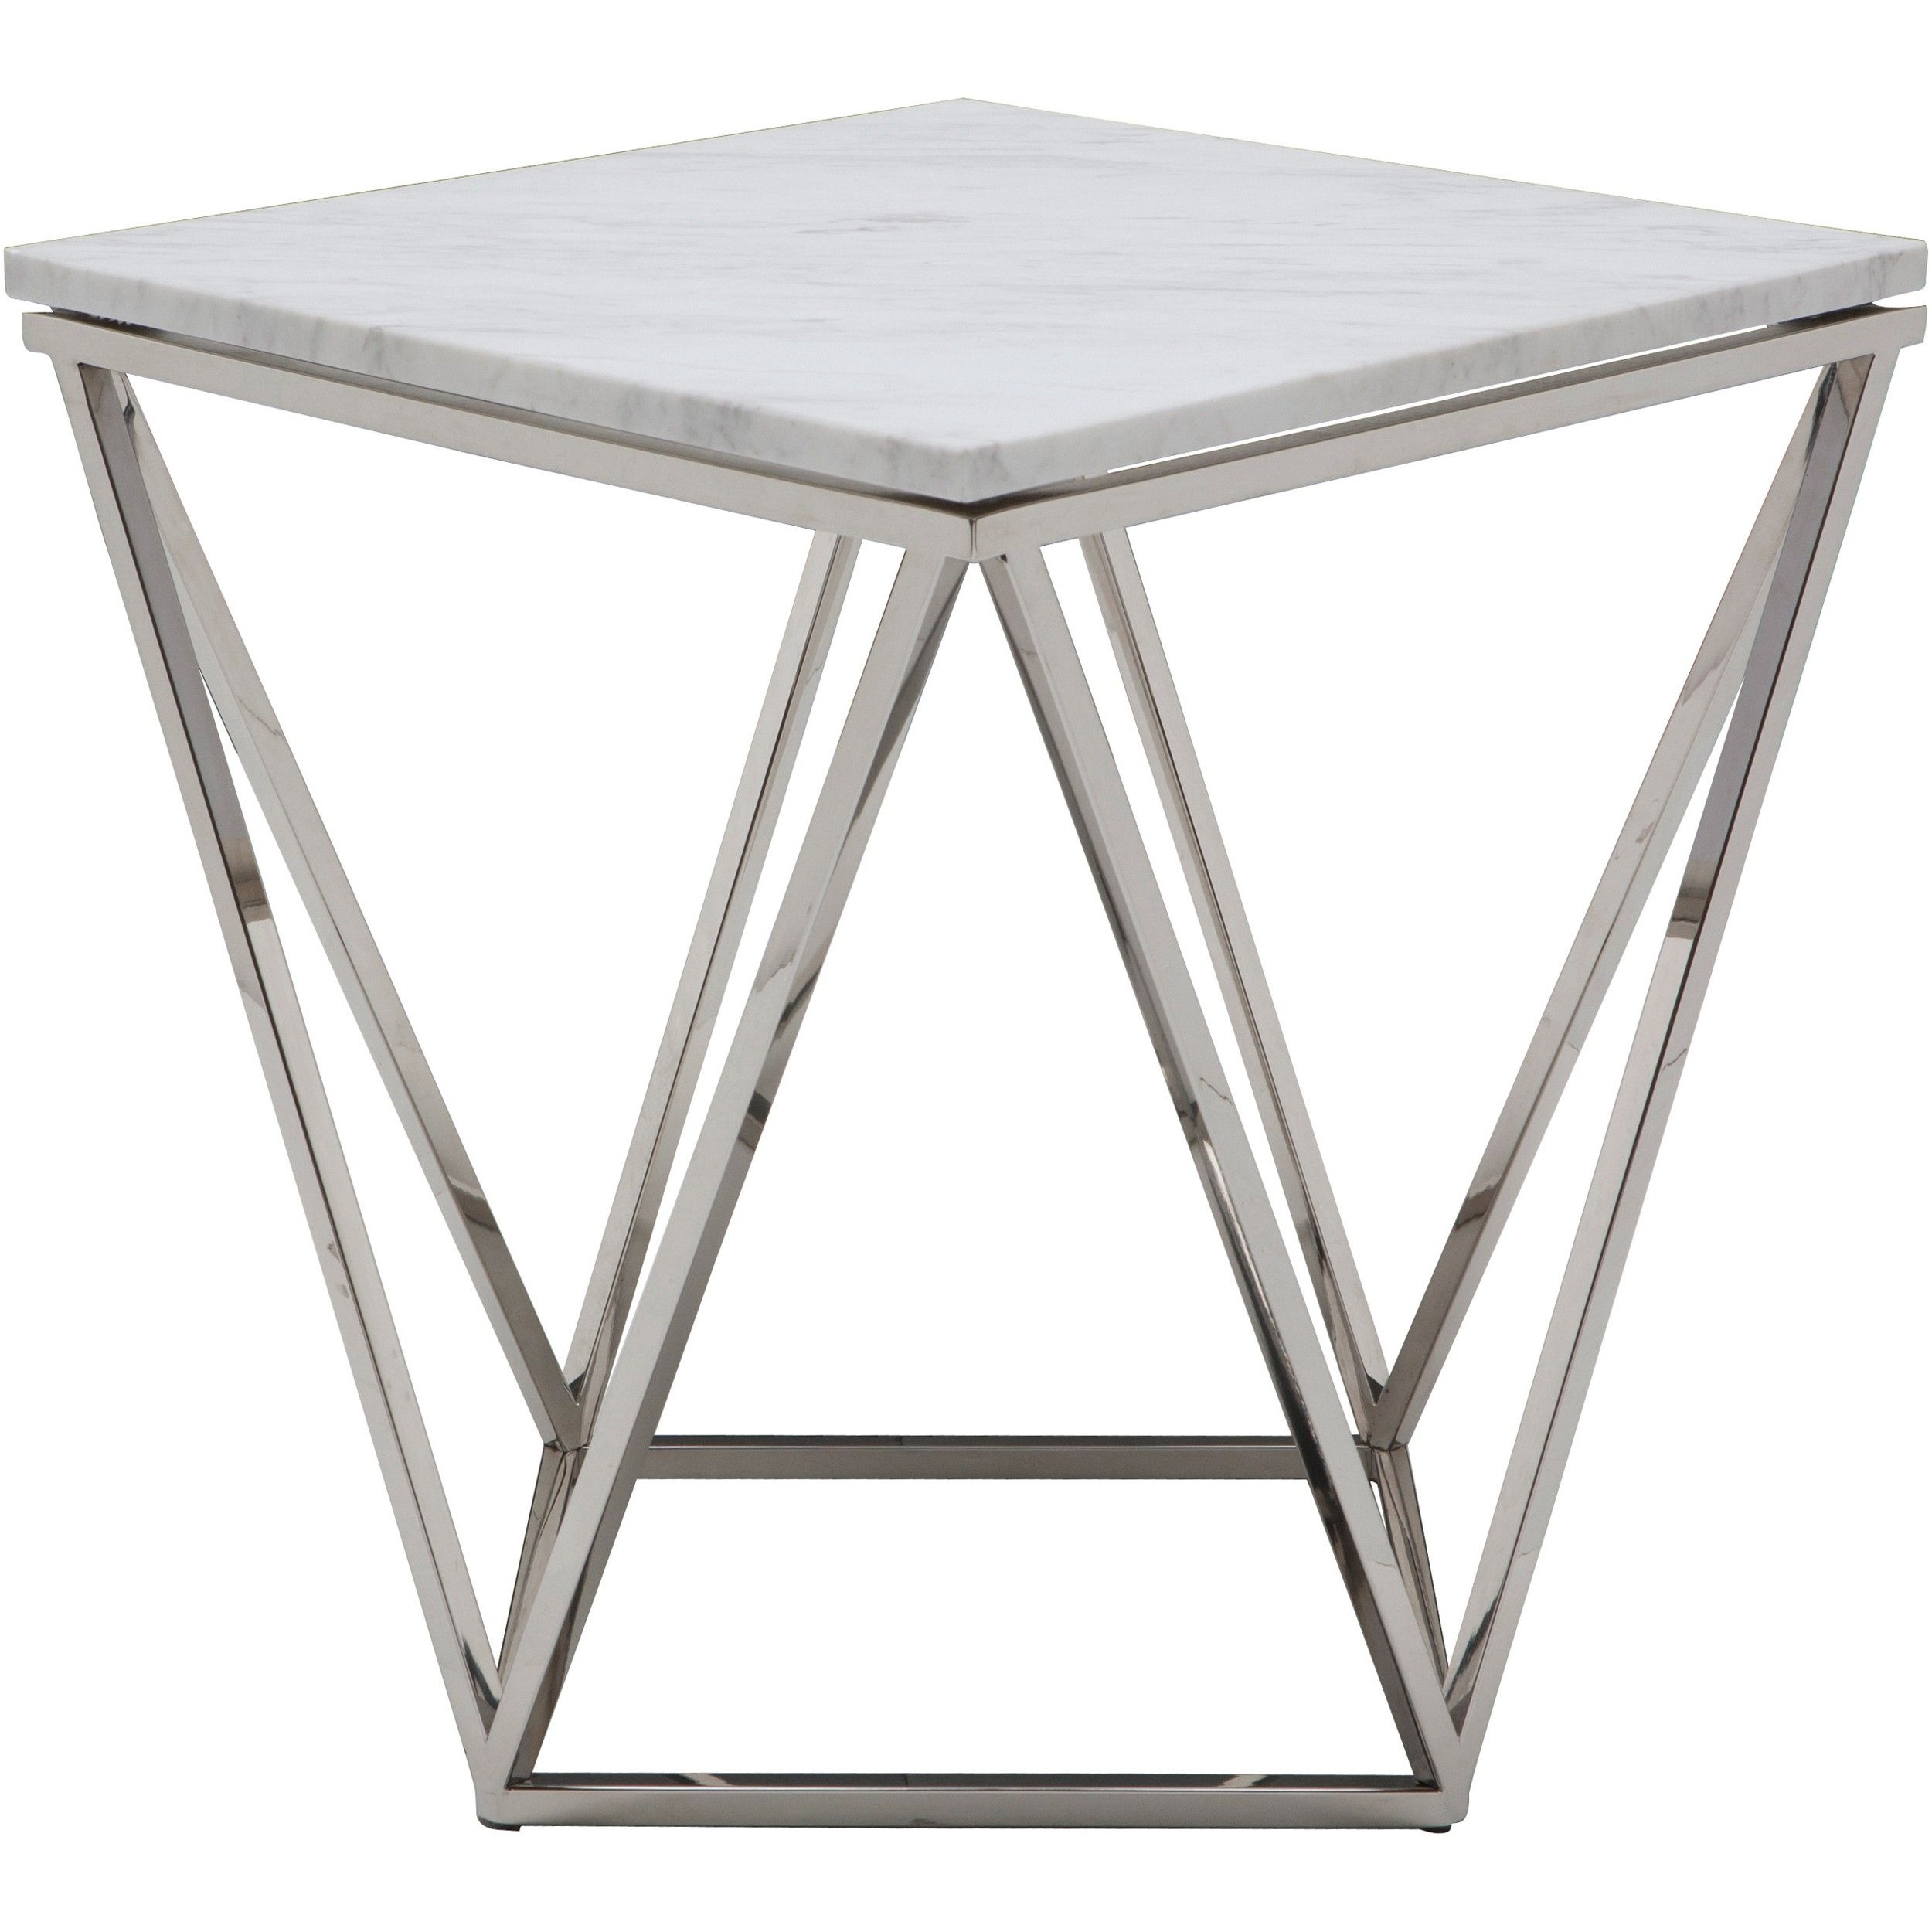 Monarch Specialties Chrome Metal Edgeside Accent Table In Glossy White Reviews Home Macy S V 2020 G Pridivannye Stoly Metallicheskaya Mebel Mebel Iz Stali